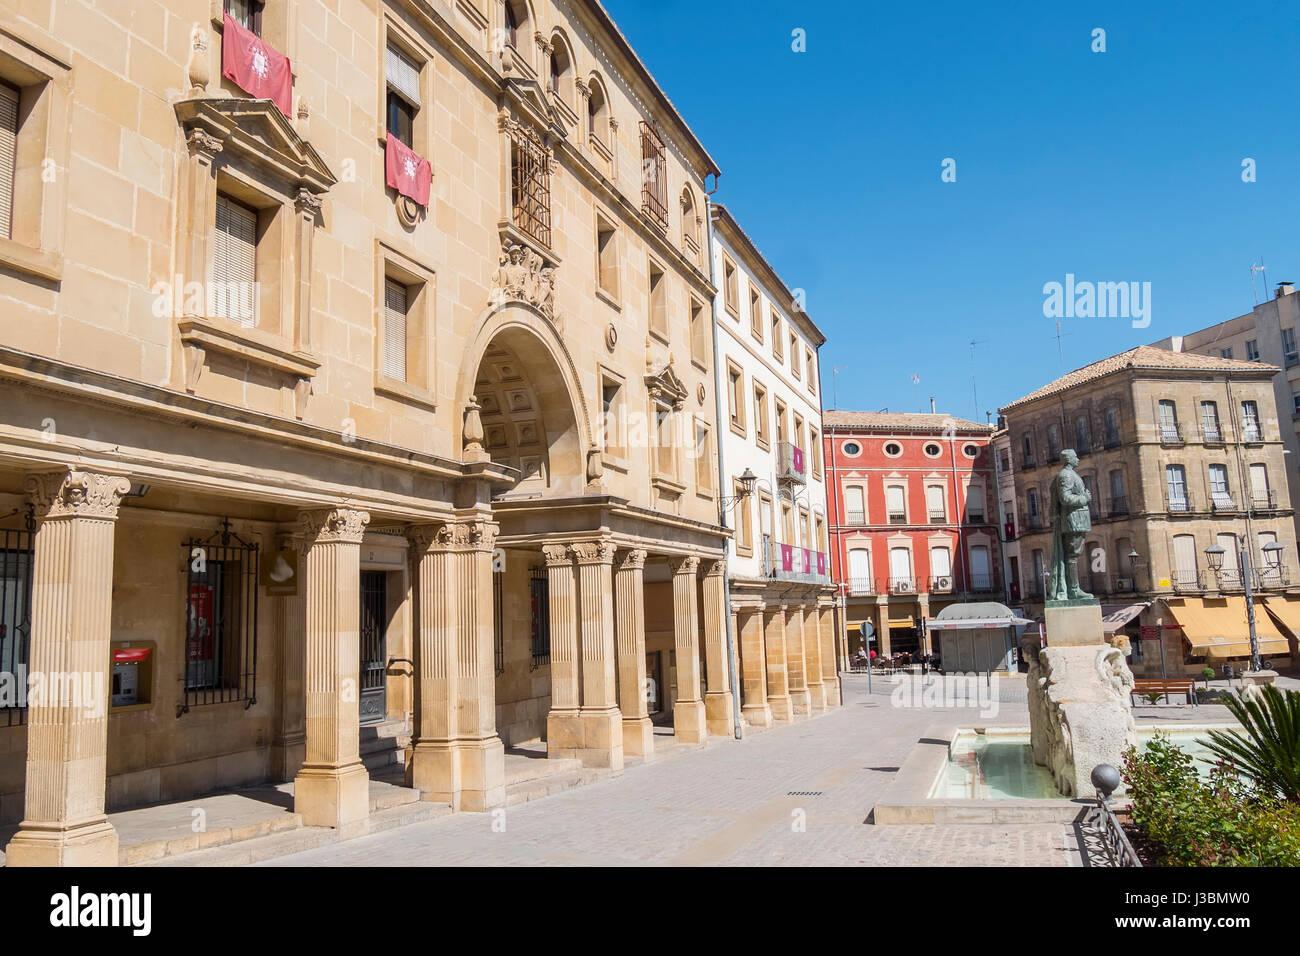 Andalucia Square, Ubeda, Jaen, Spain Stock Photo